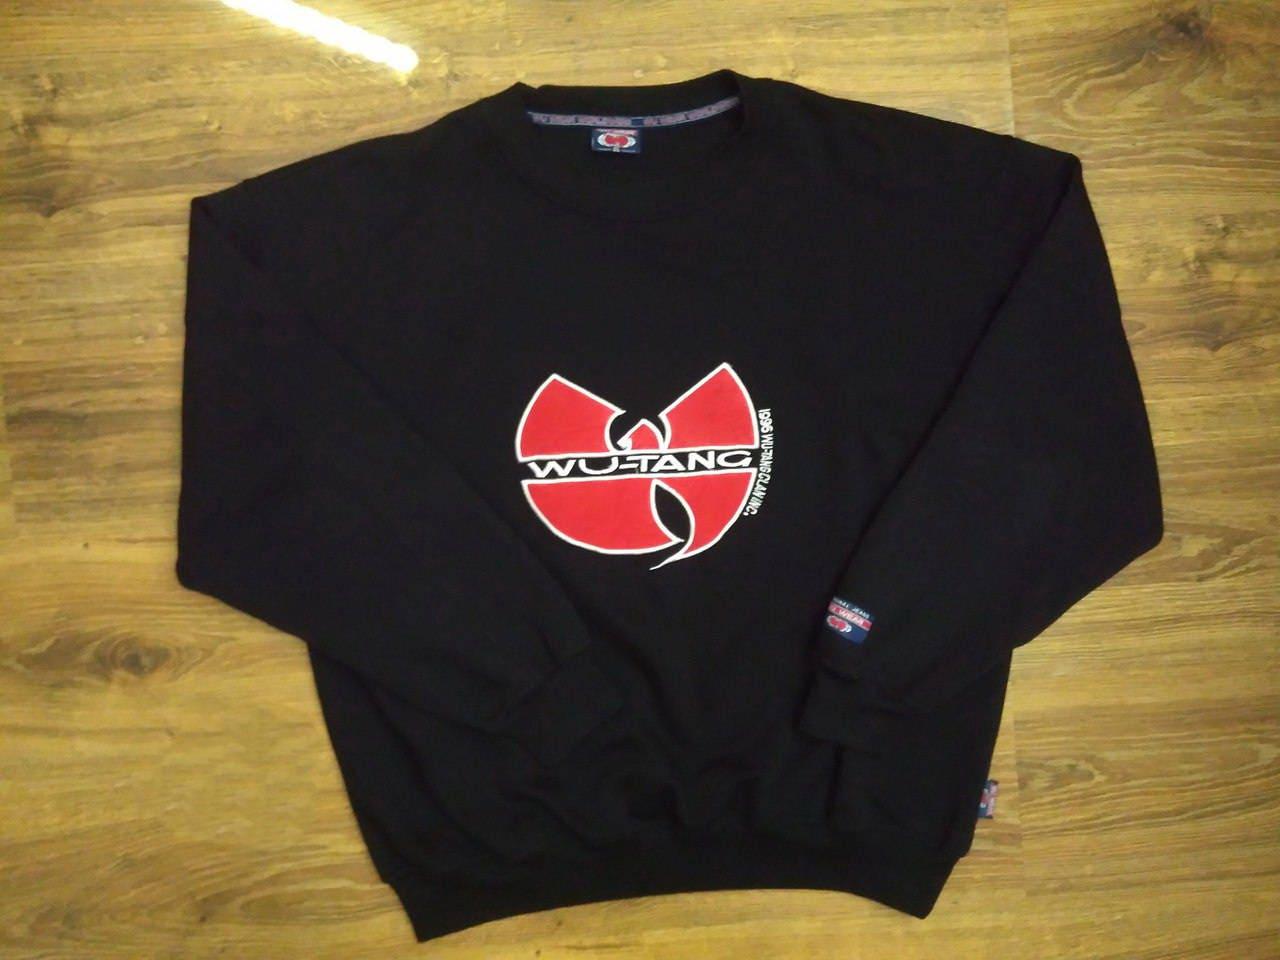 fa49ee1254a WU WEAR sweatshirt Wu Tang jacket vintage hip hop sweat